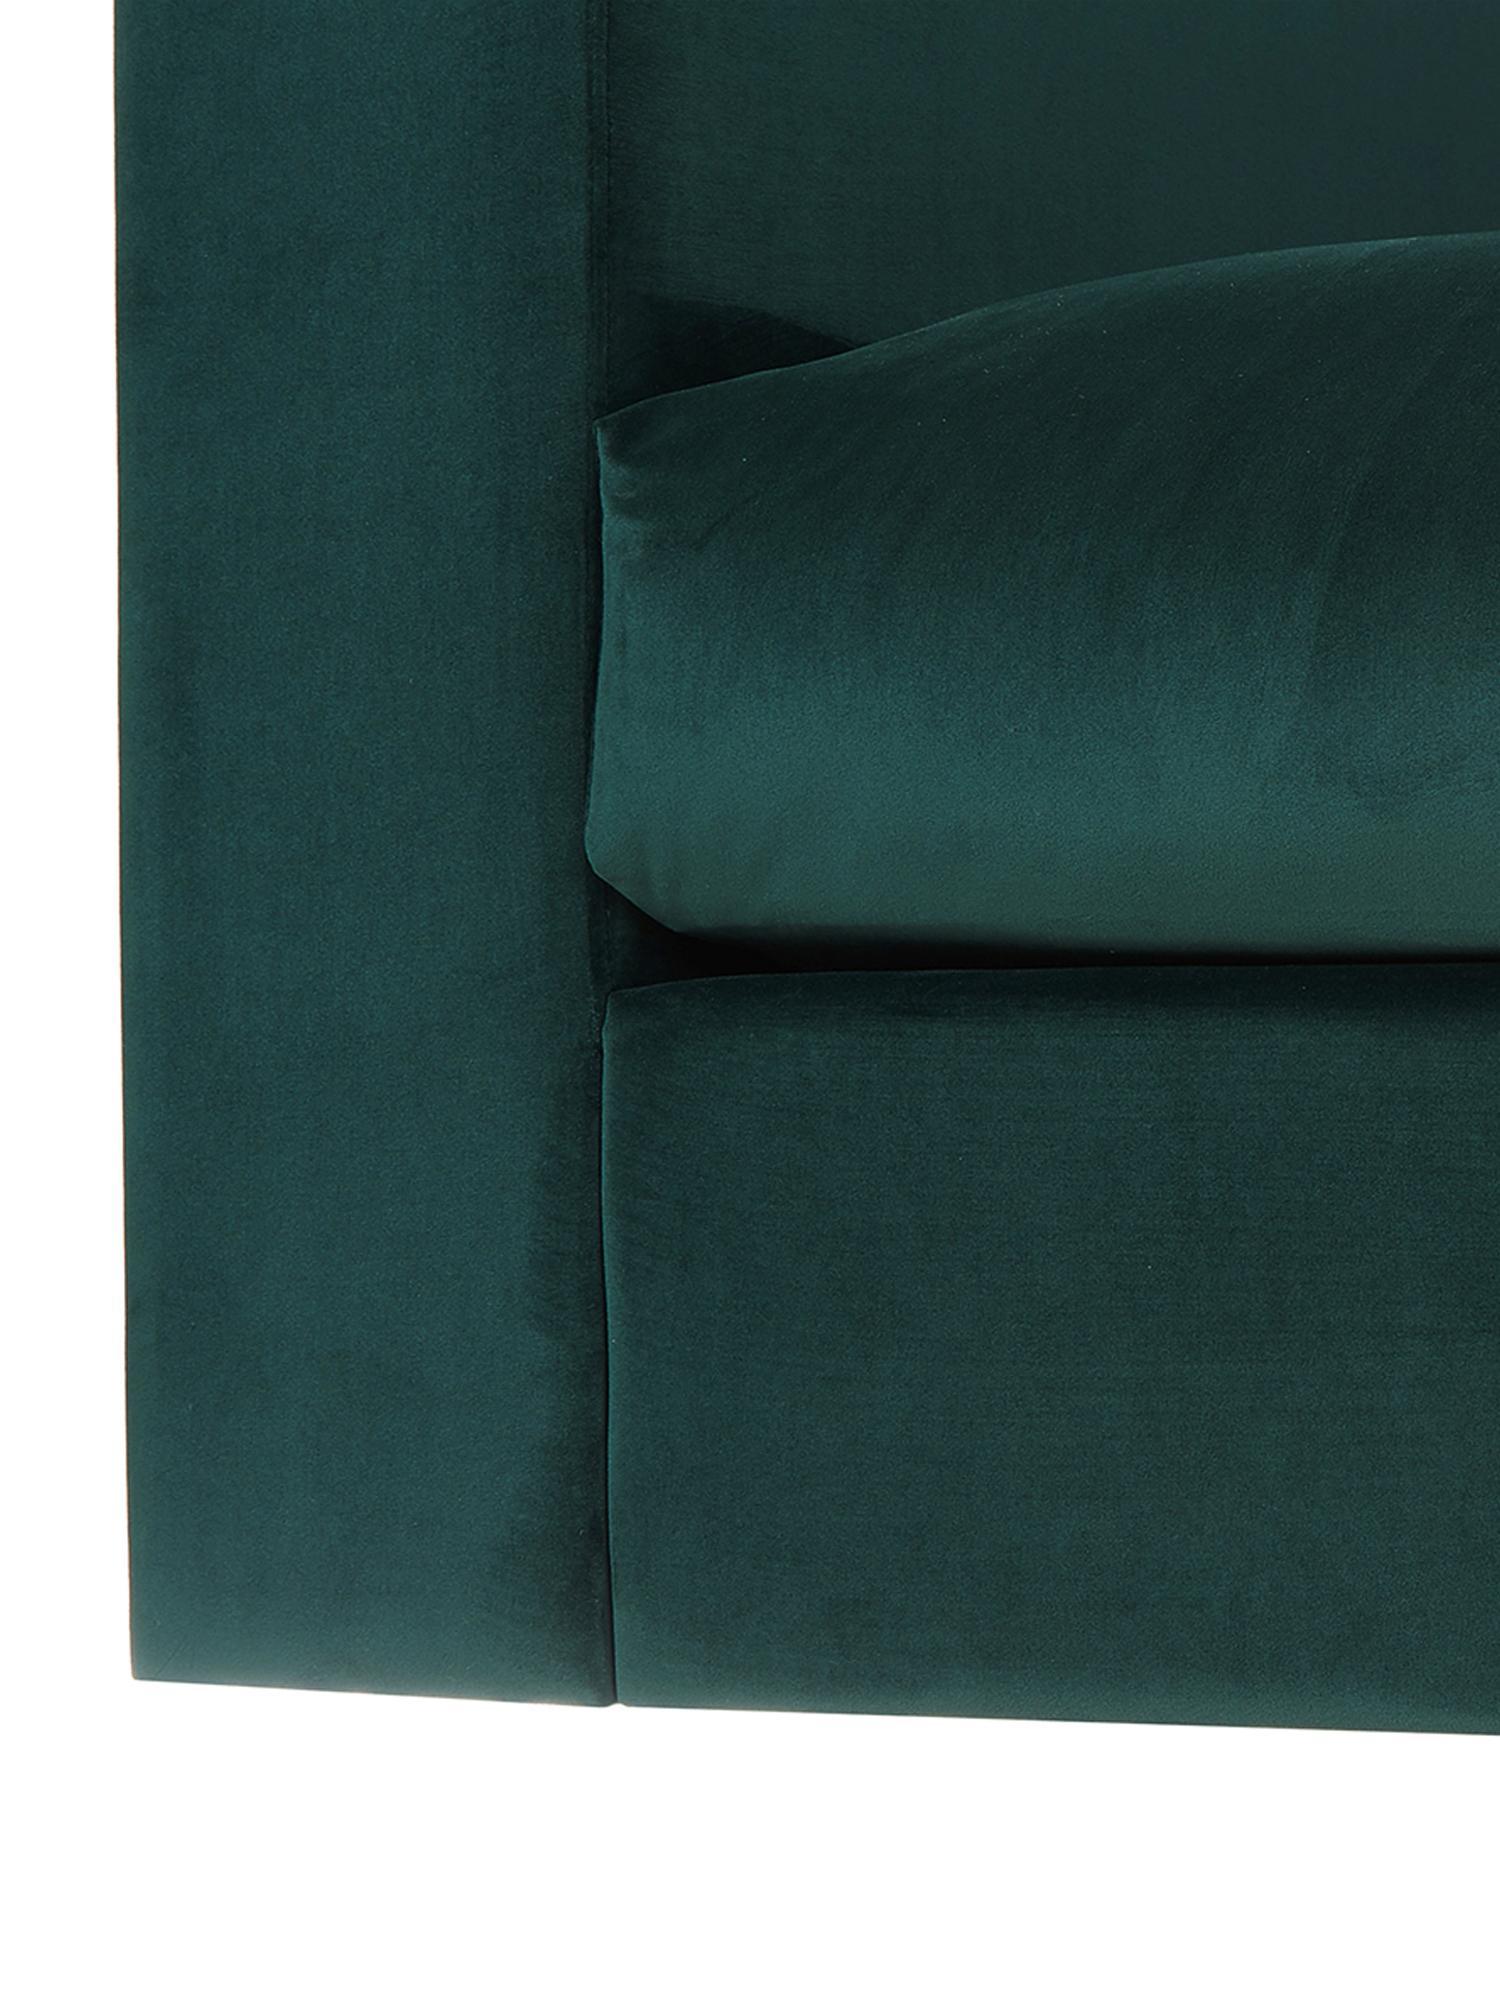 Samt-Sofa Balmira (3-Sitzer), Bezug: Samt (Polyester) 100.000 , Gestell: Massives Kiefernholz, Füße: Massives Birkenholz, lack, Samt Dunkelgrün, B 240 x T 96 cm